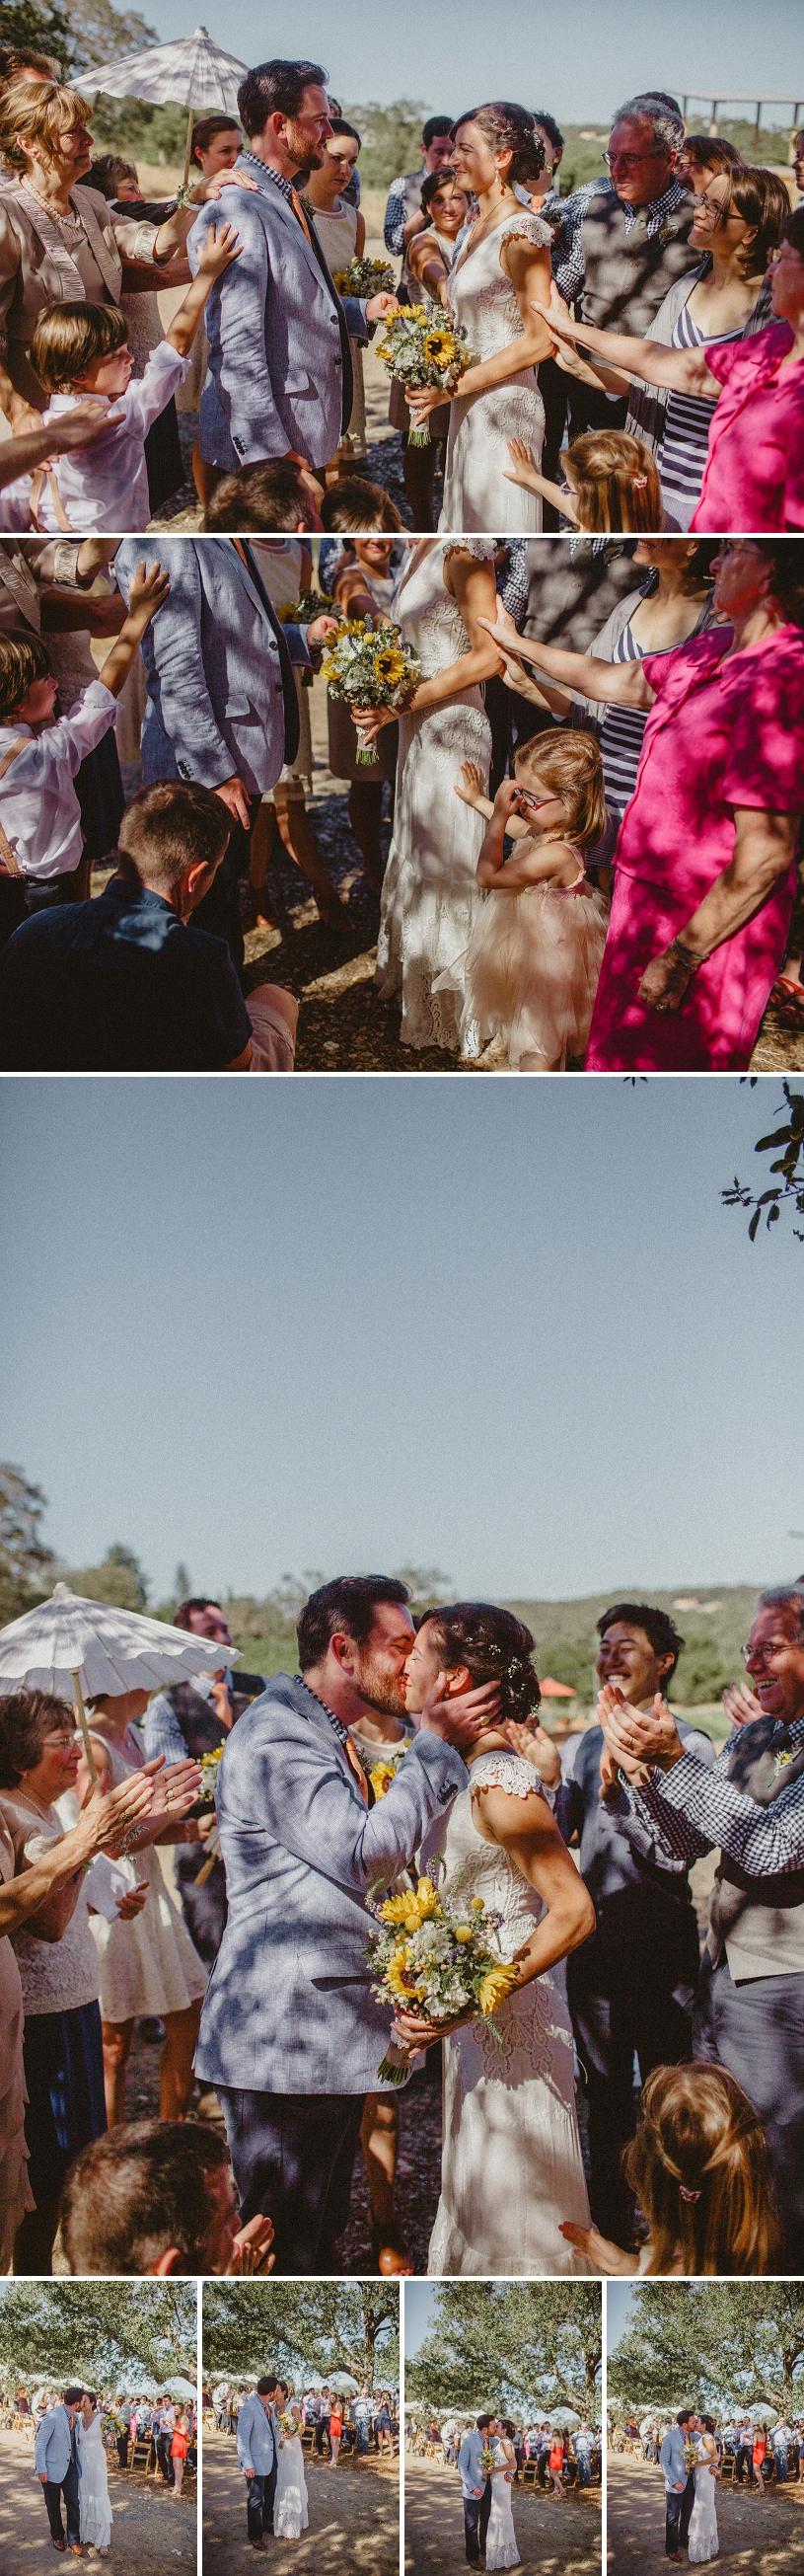 healdsburg-private-estate-wedding-ceremony5